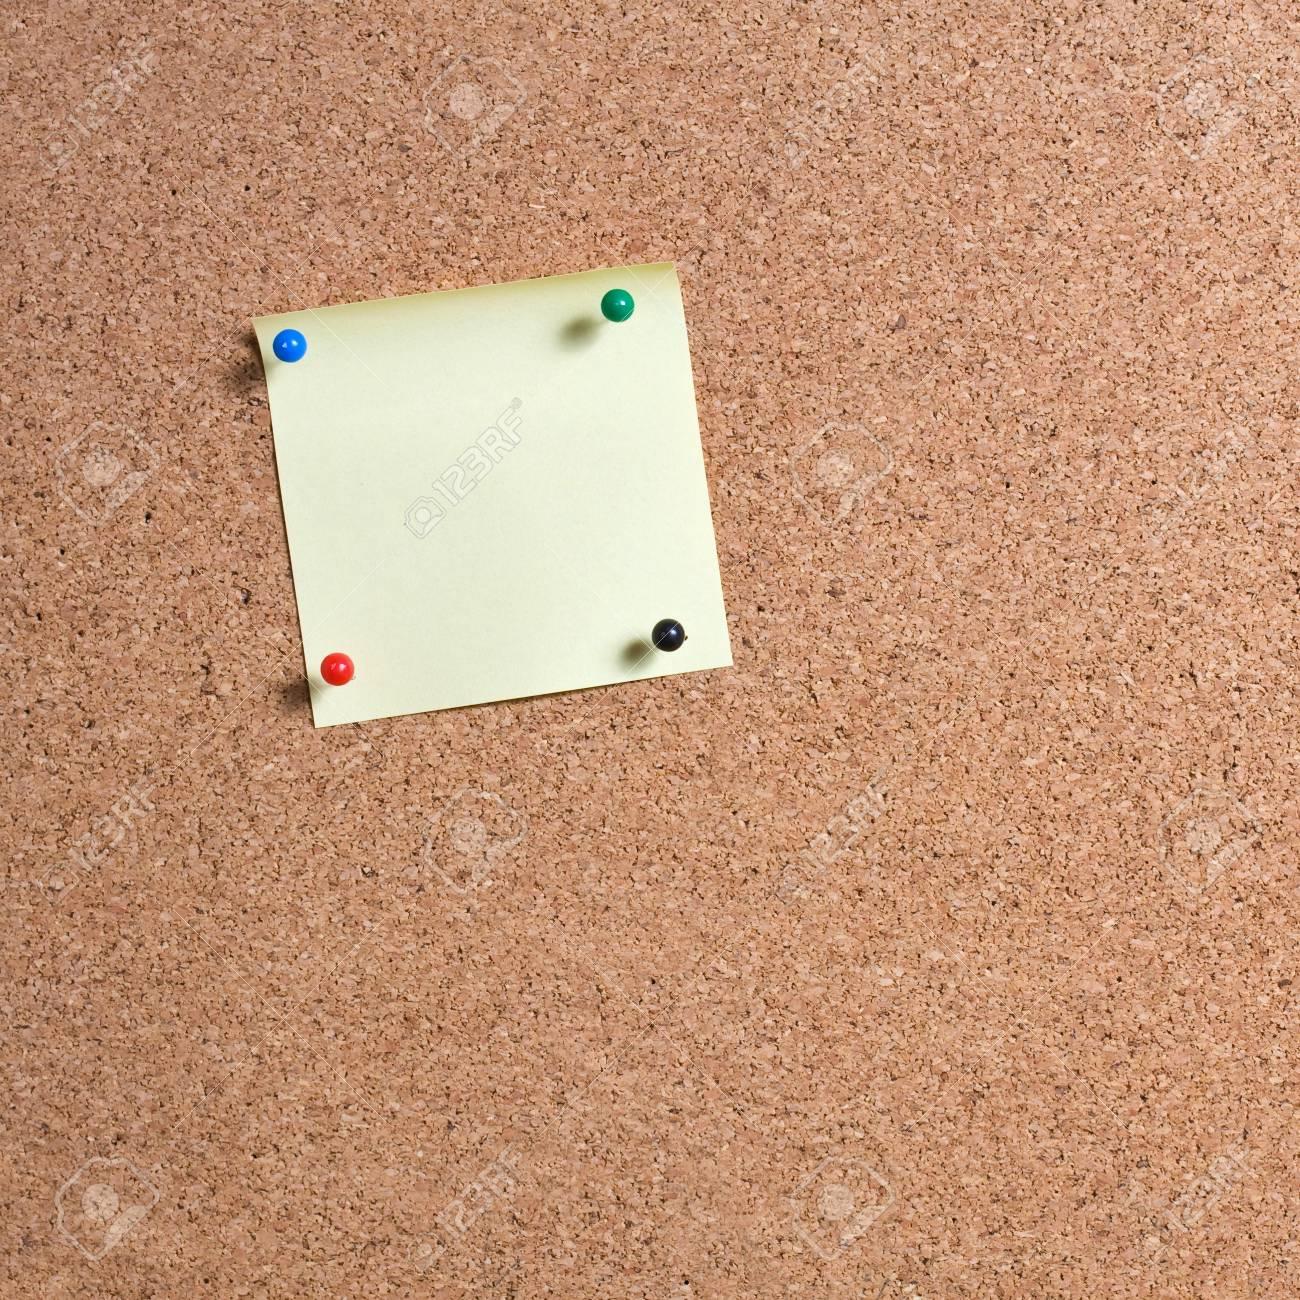 Yellow Memo Stick On Cork Board Background Stock Photo Picture 1300x1300